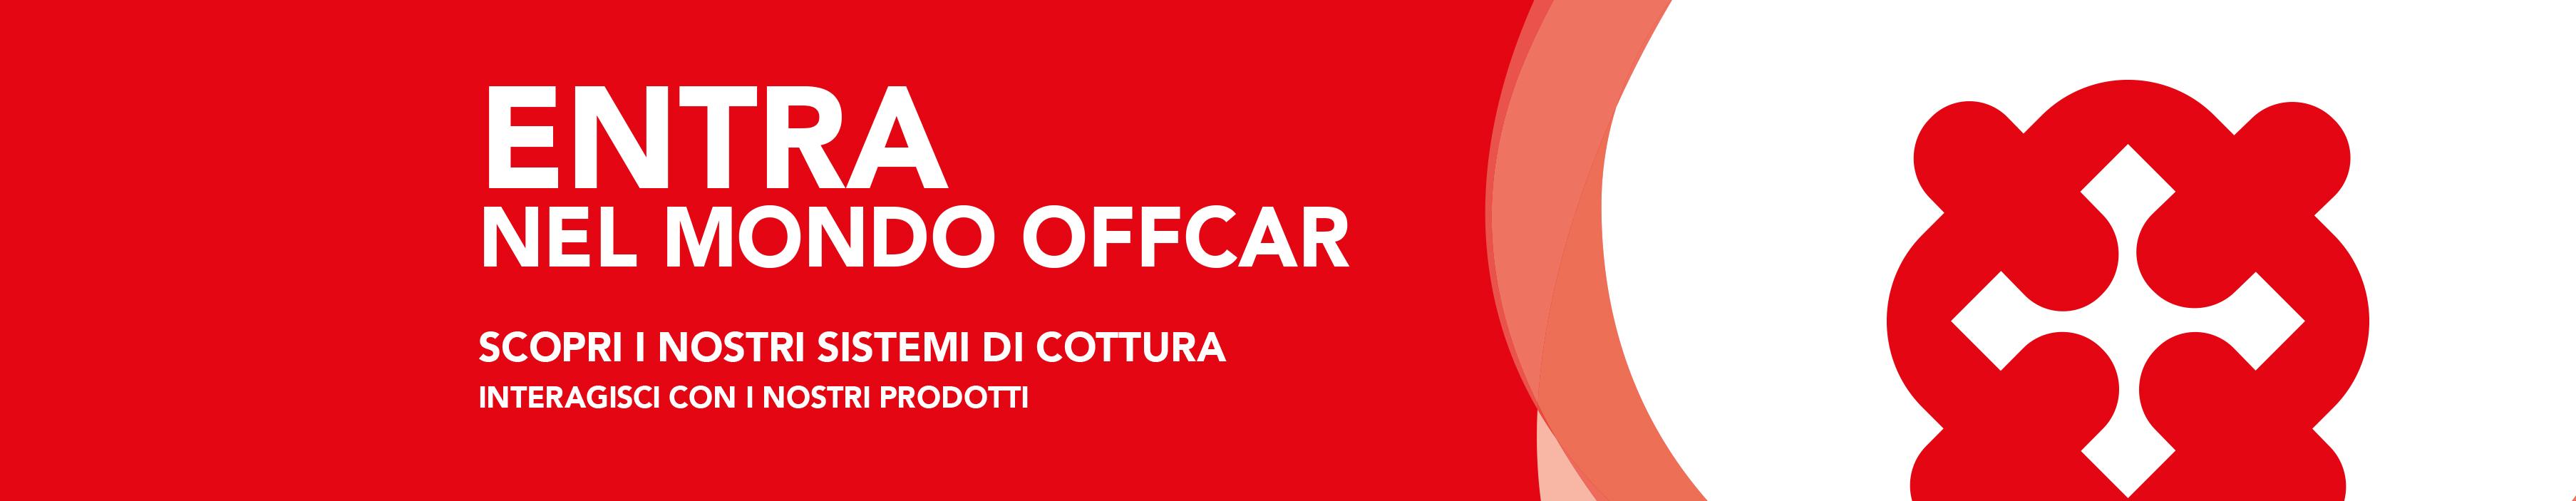 offcar_cta_ita